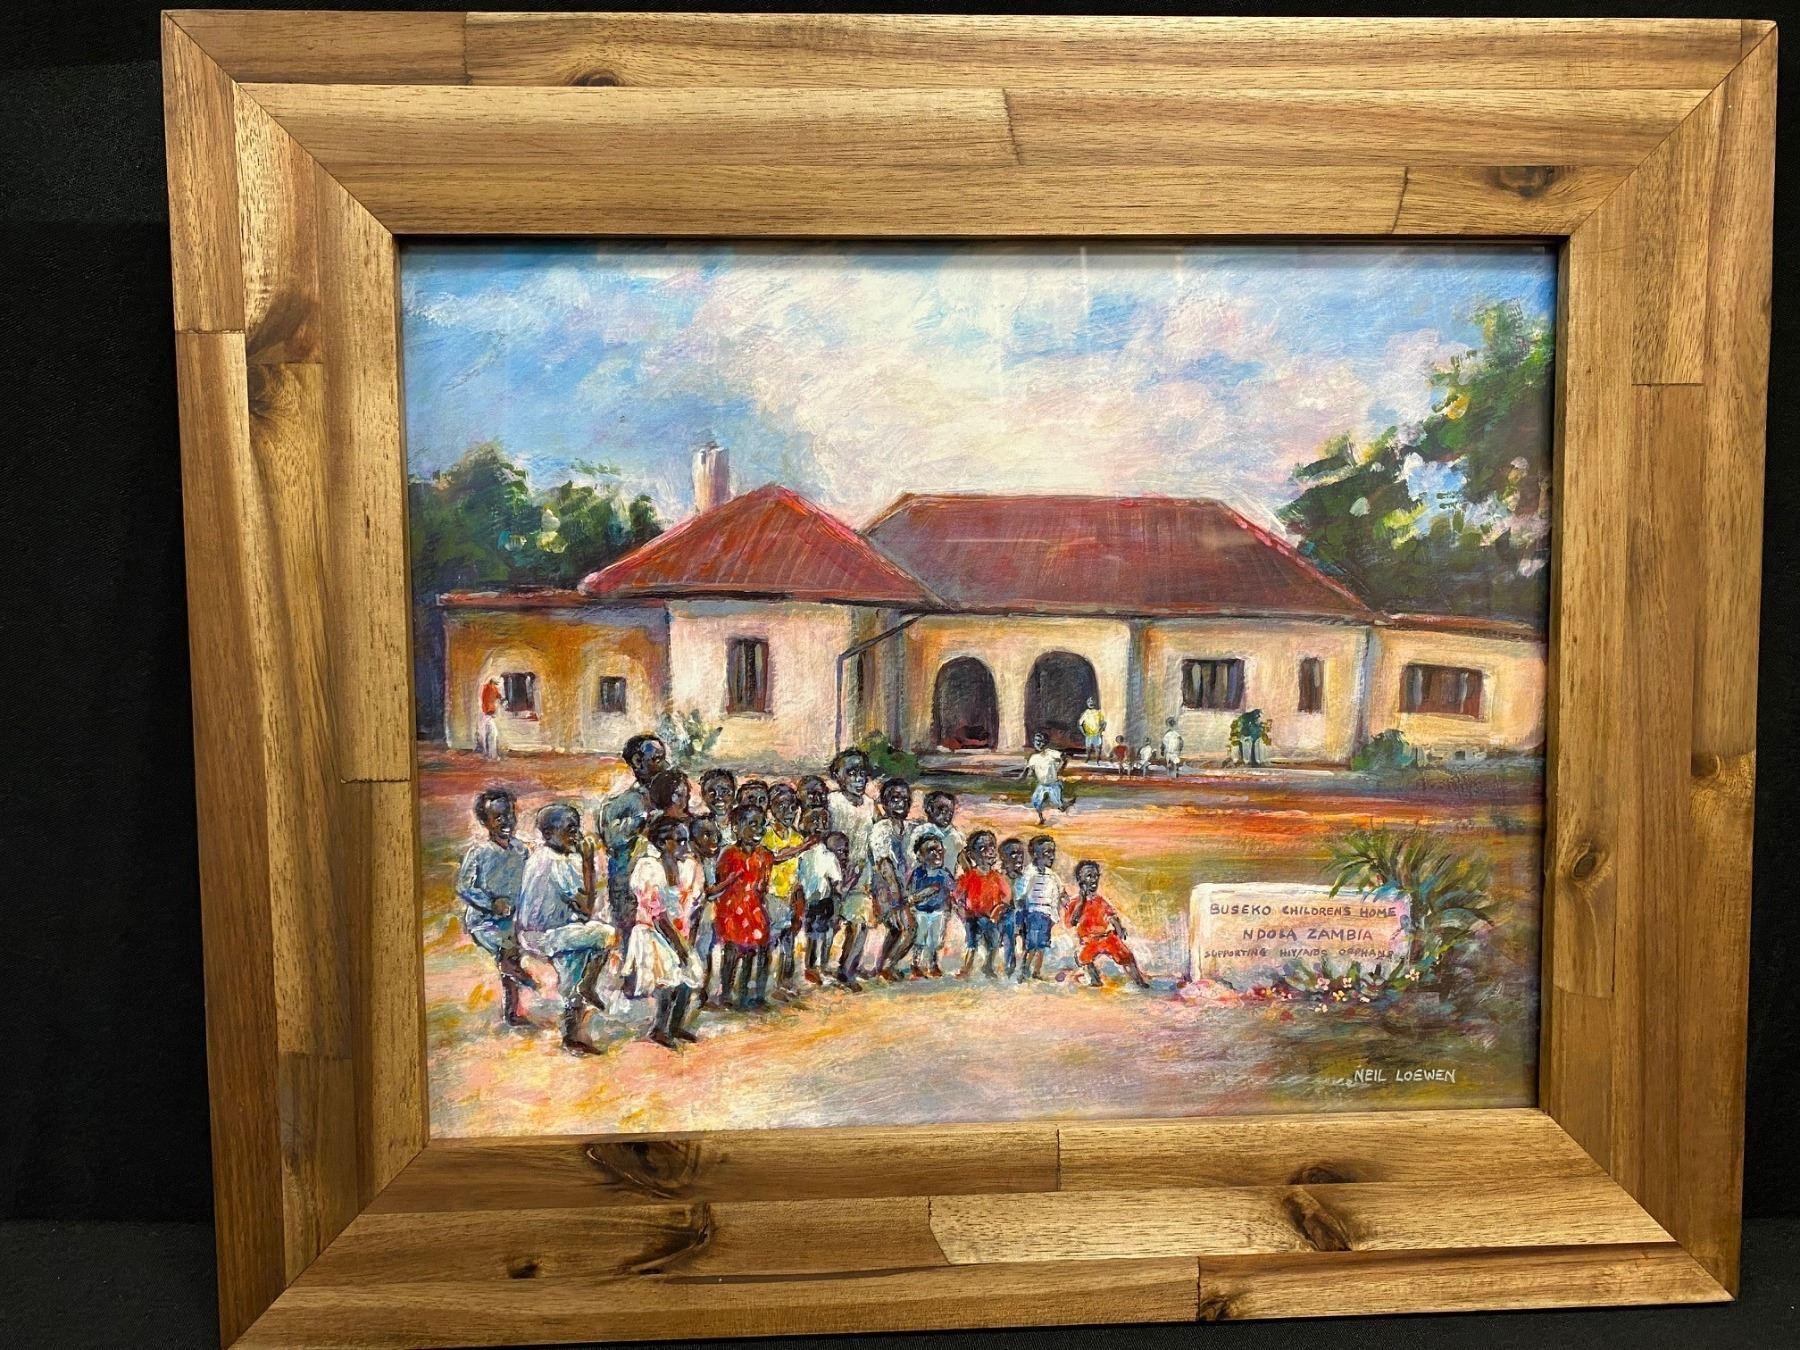 10 x 13 Framed Print  - Buseko Home